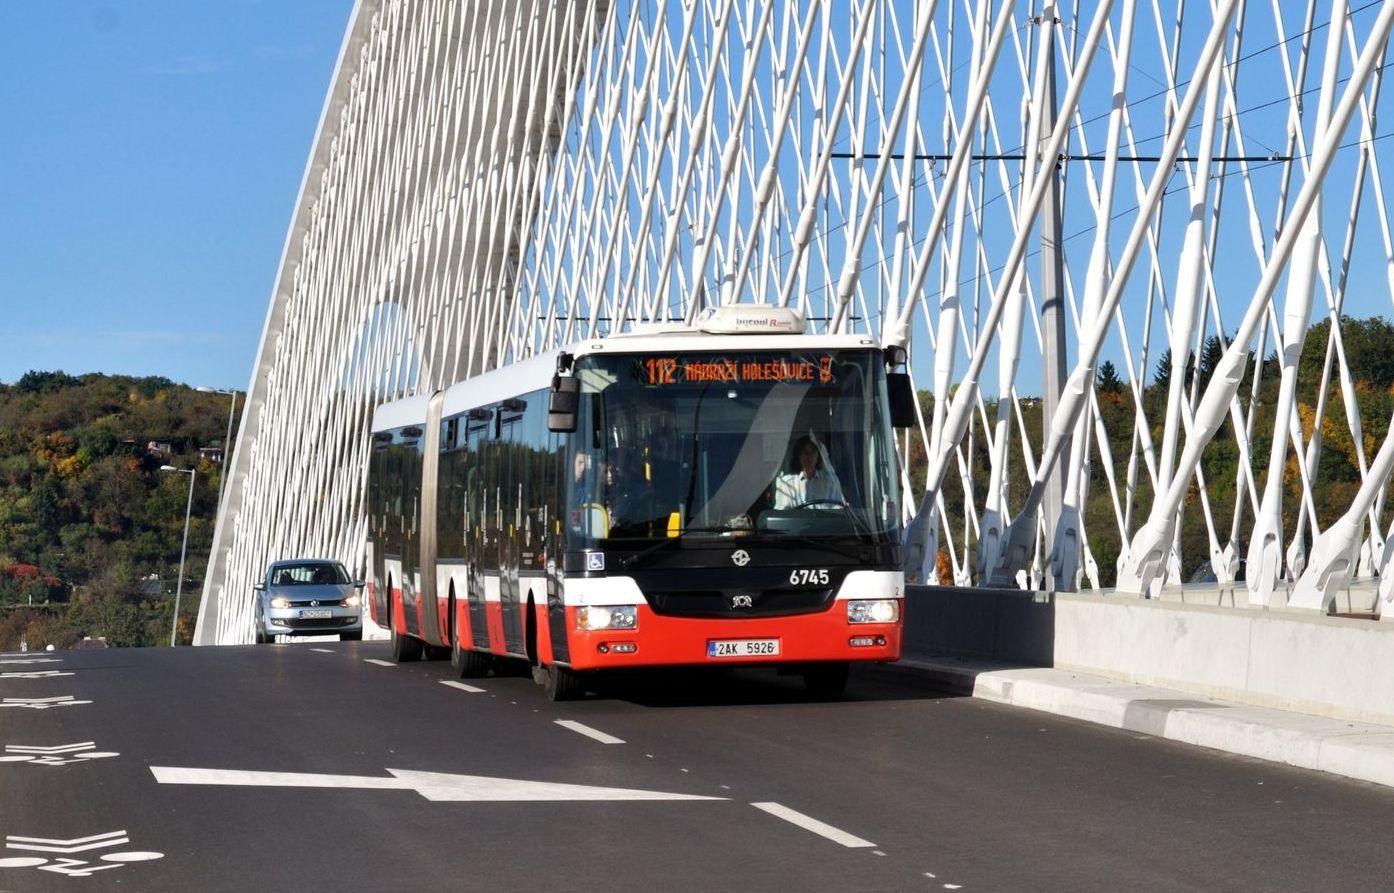 Autobusová linka 112 v Praze. Pramen: ROPID